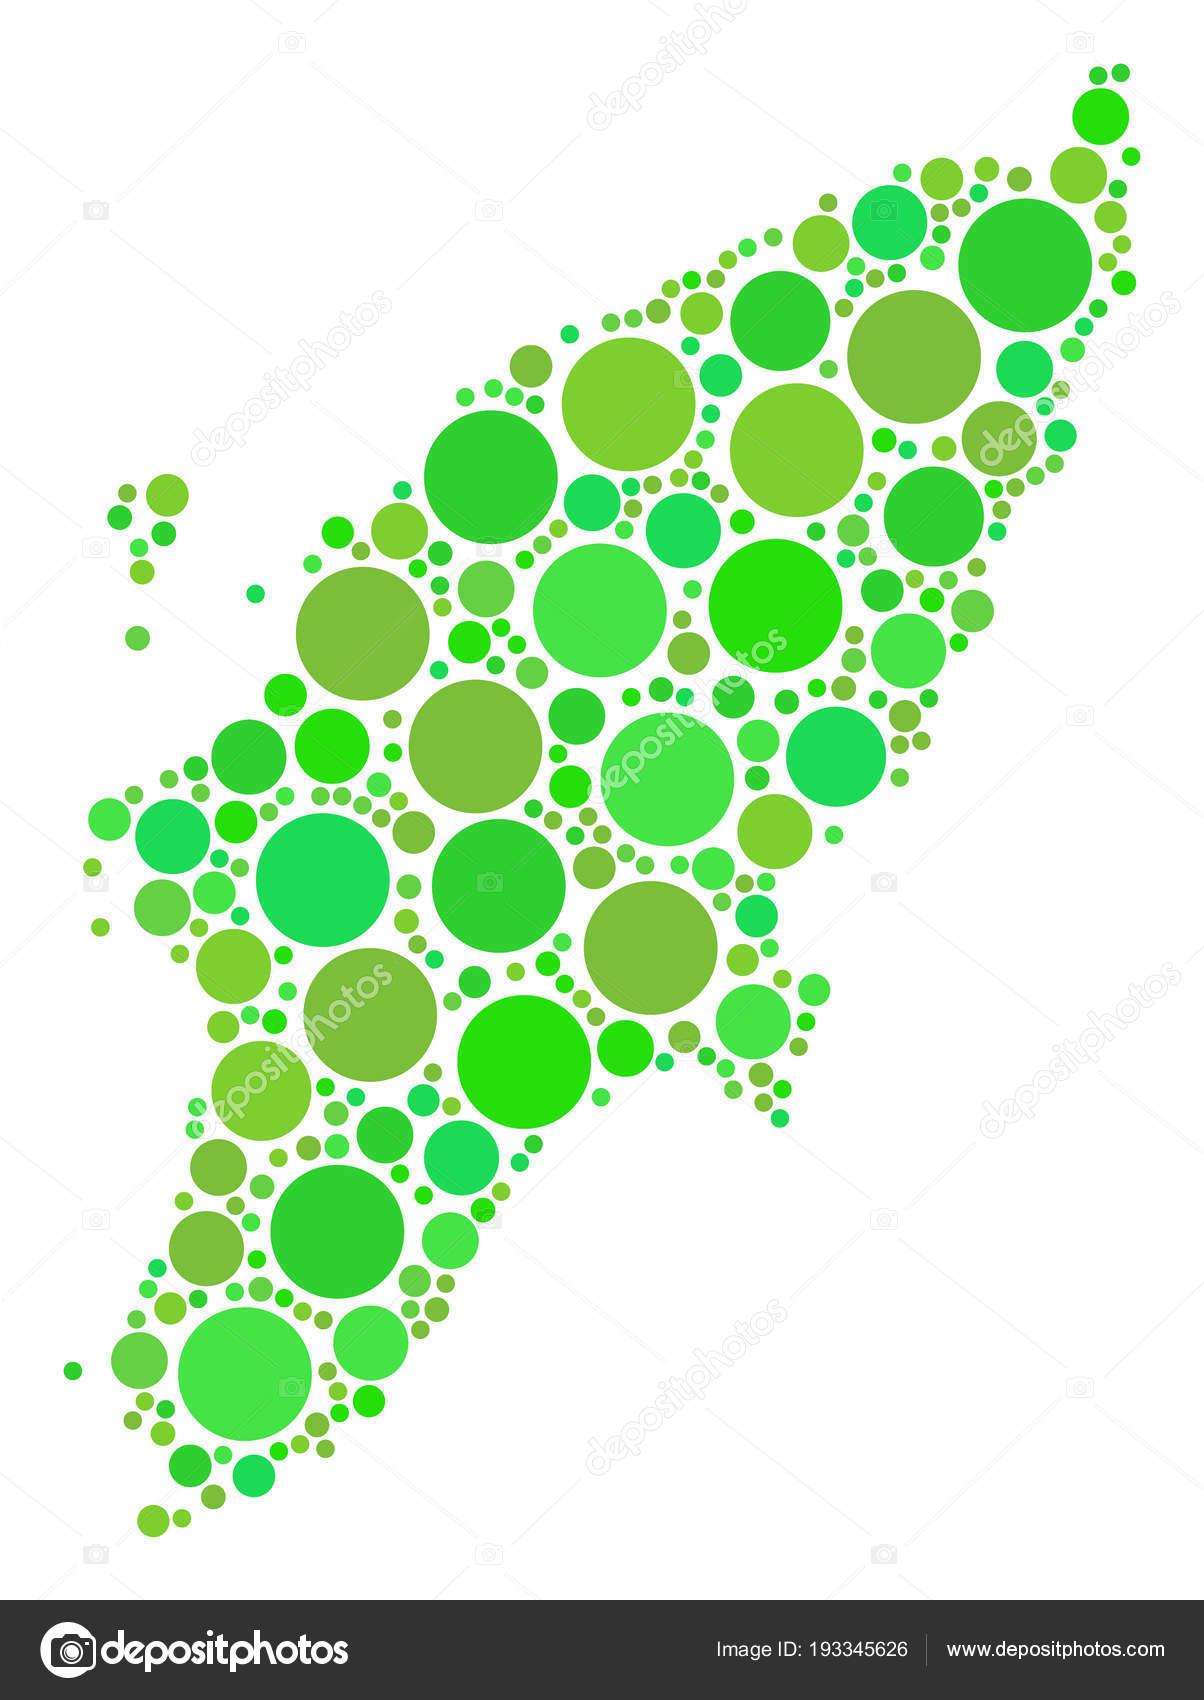 Rhodes Island Greece Map.Greek Rhodes Island Map Composition Of Dots Stock Vector C Ahasoft